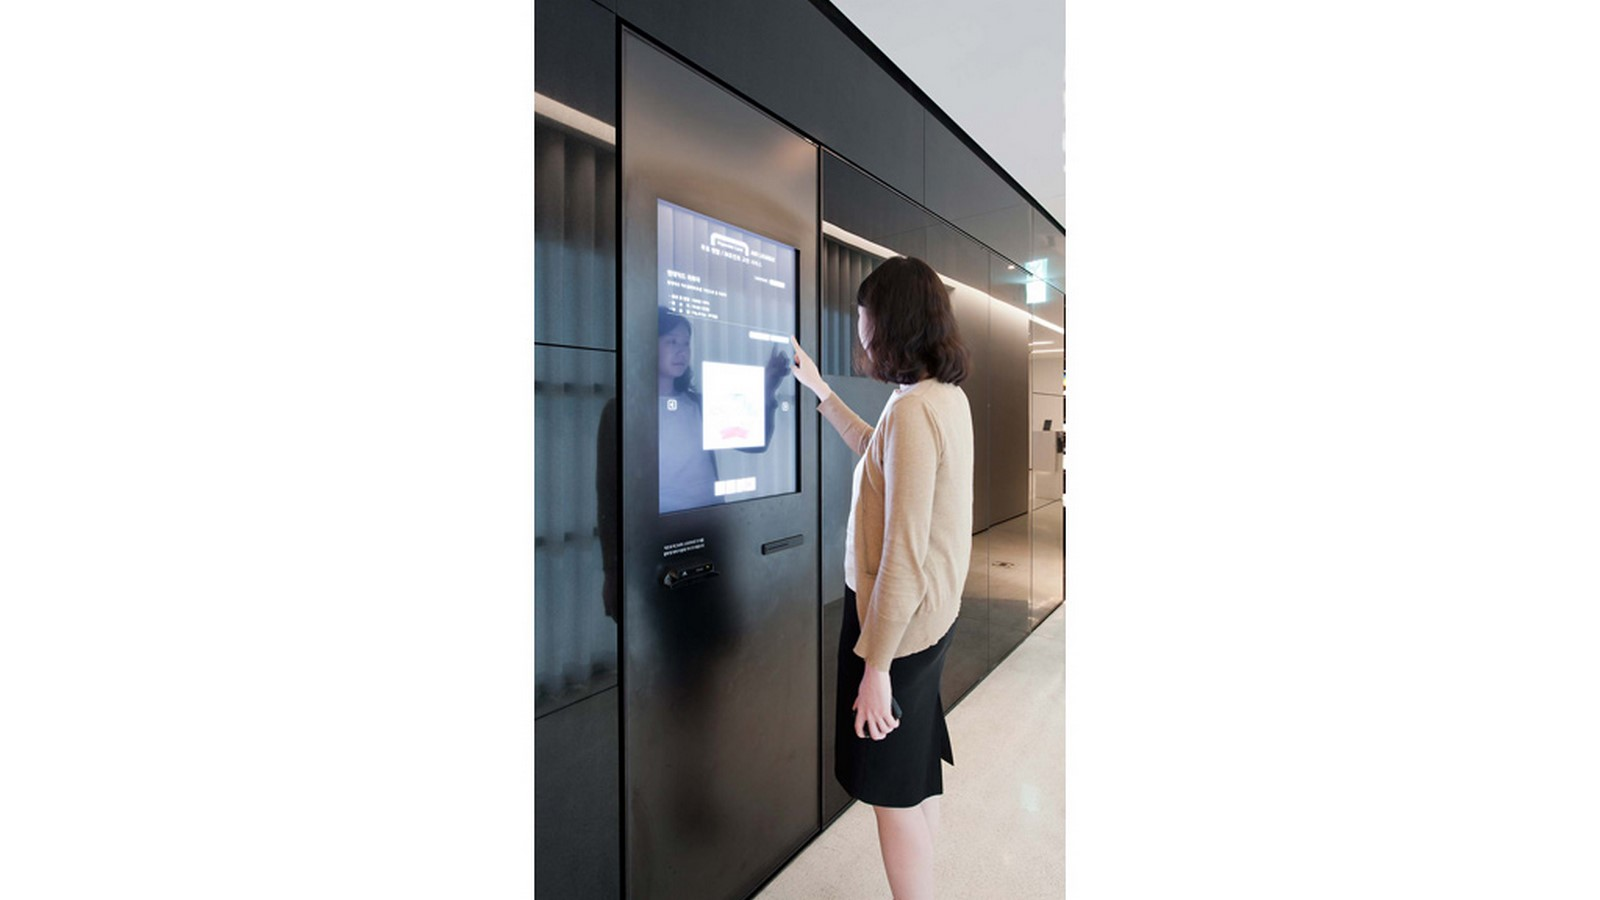 HyundaiCard Air Lounge - Incheon International Airport - Sheet5